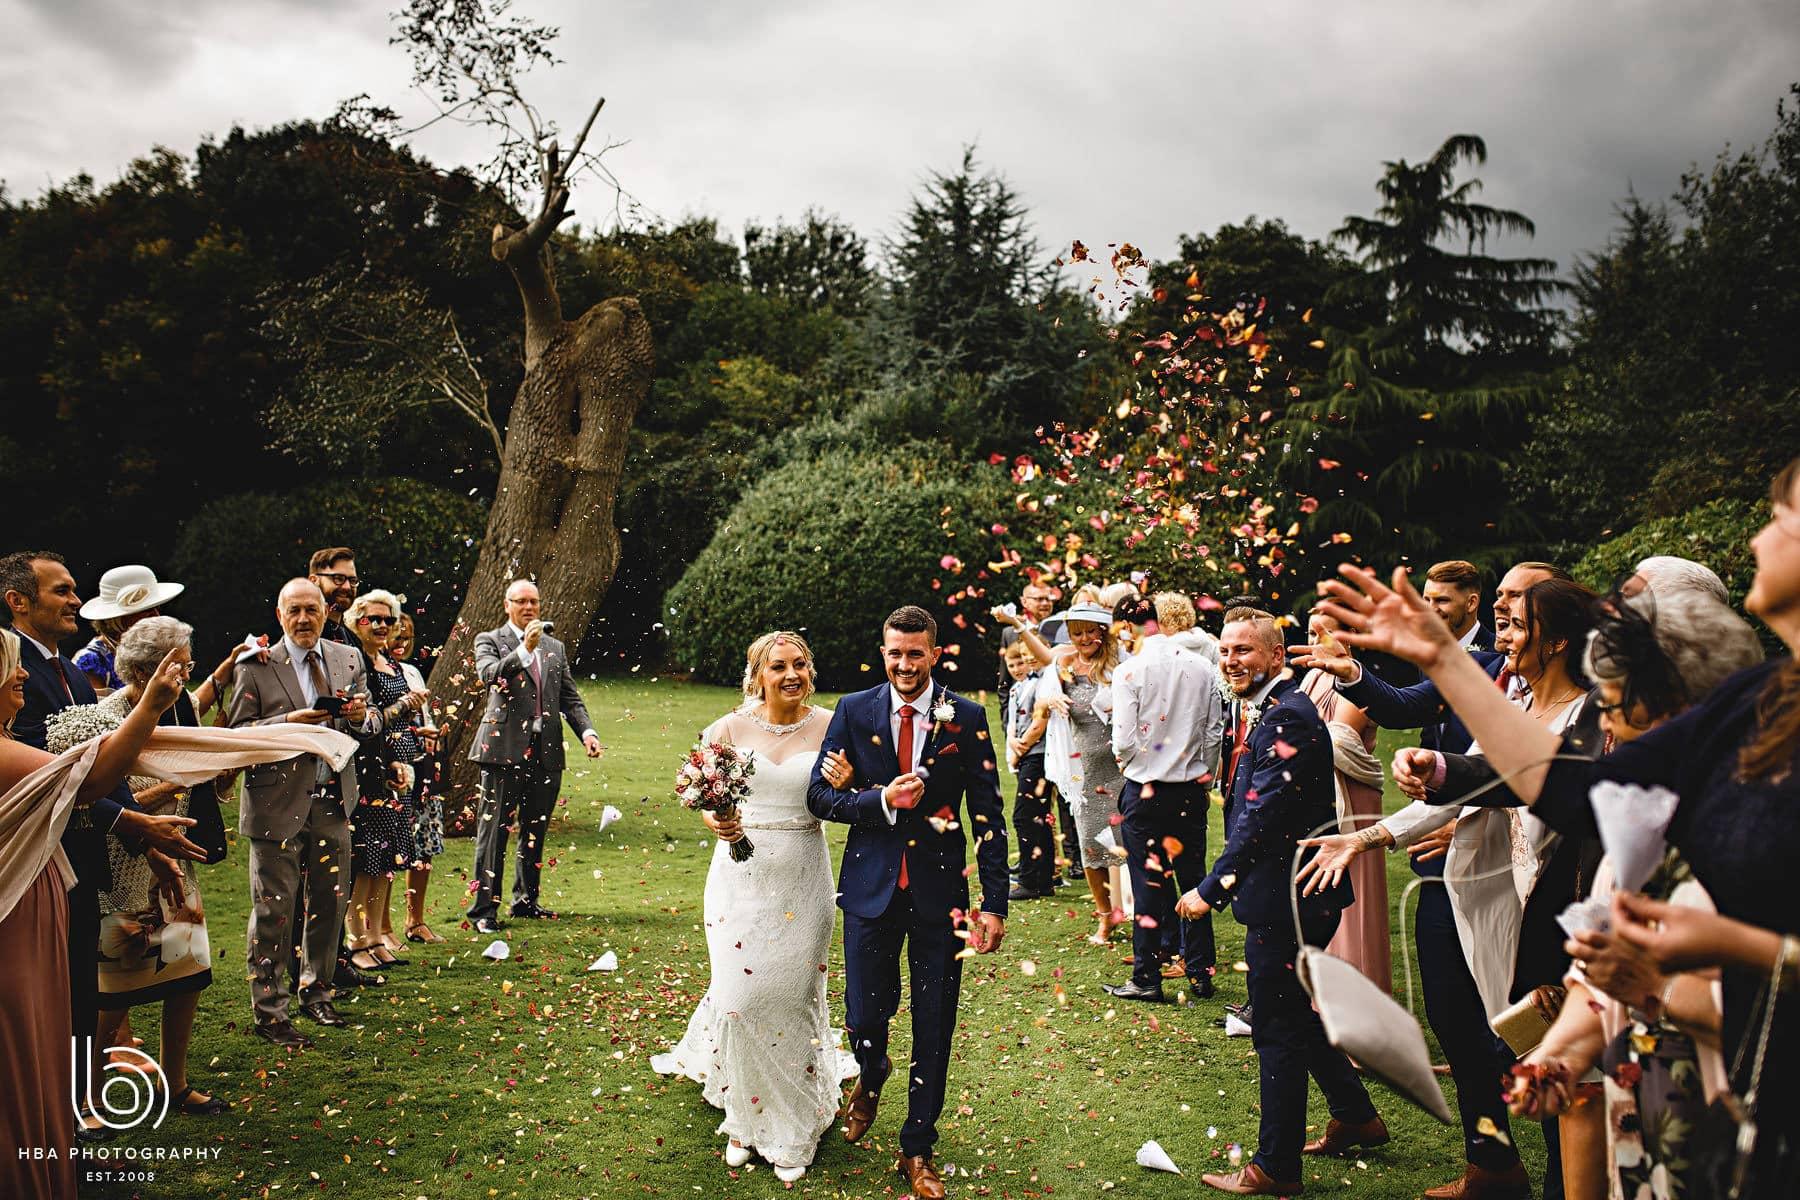 bride & groom getting covered in confetti